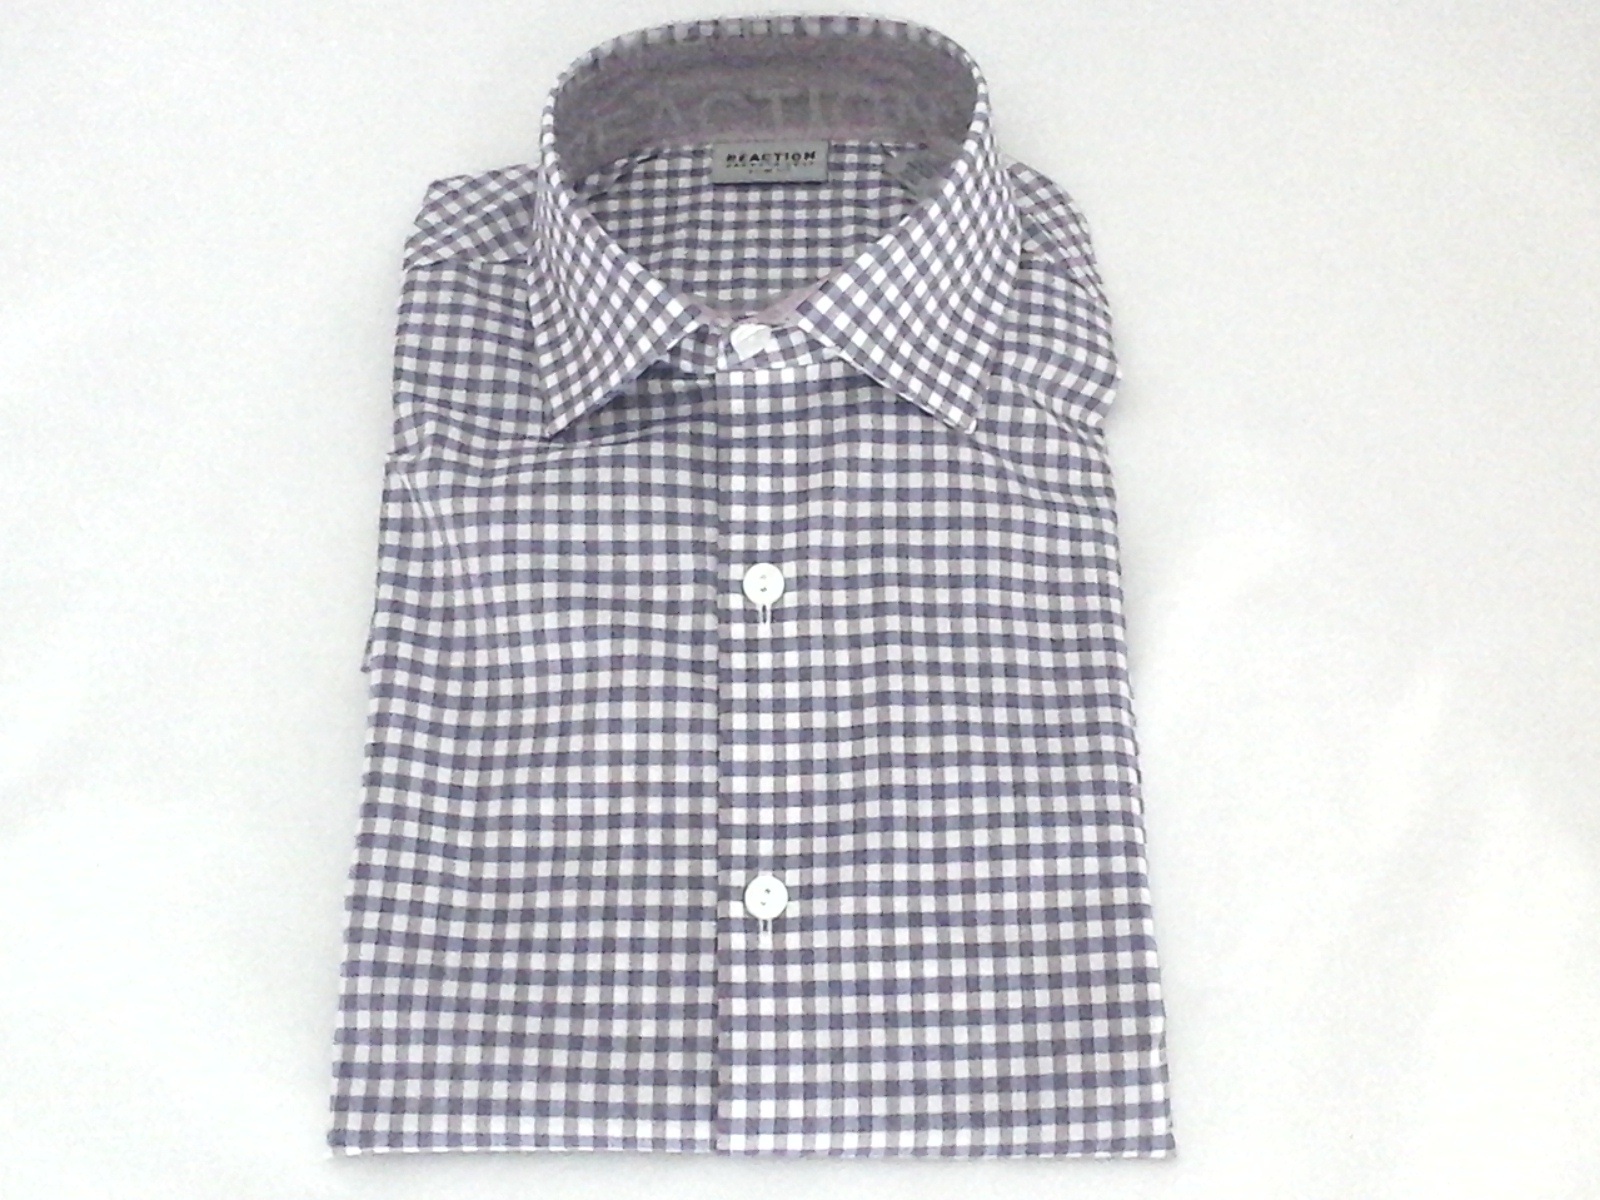 f5bee3430c KENNETH COLE Berry Plaid Slim Fit Stretch Dress Shirt Mens M 32-33 $69.50